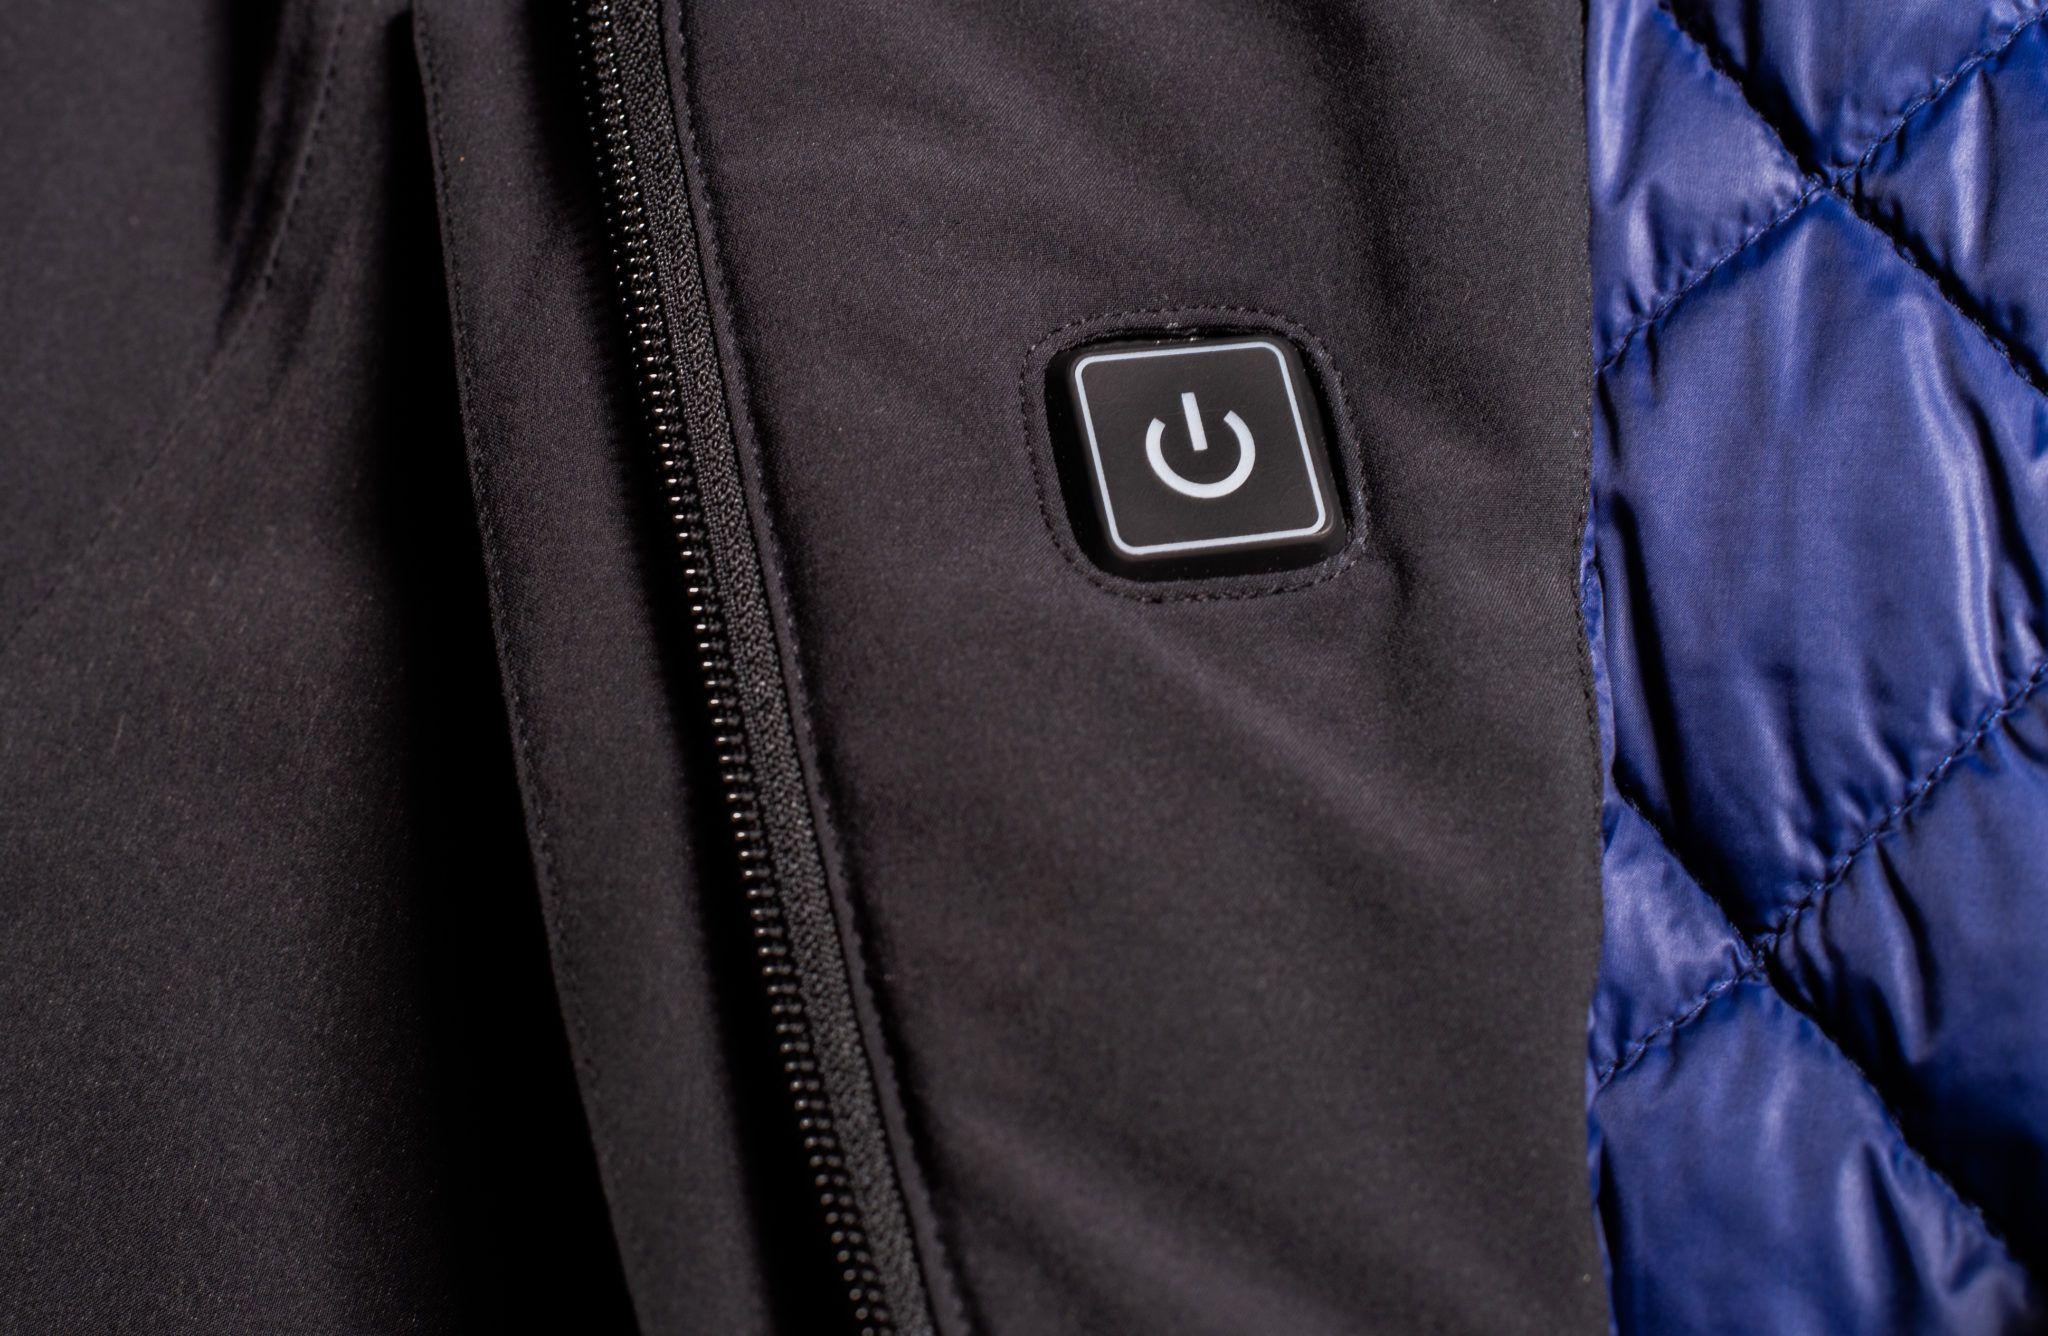 Ultra Coat The ultimate weatherproof jacket and heated